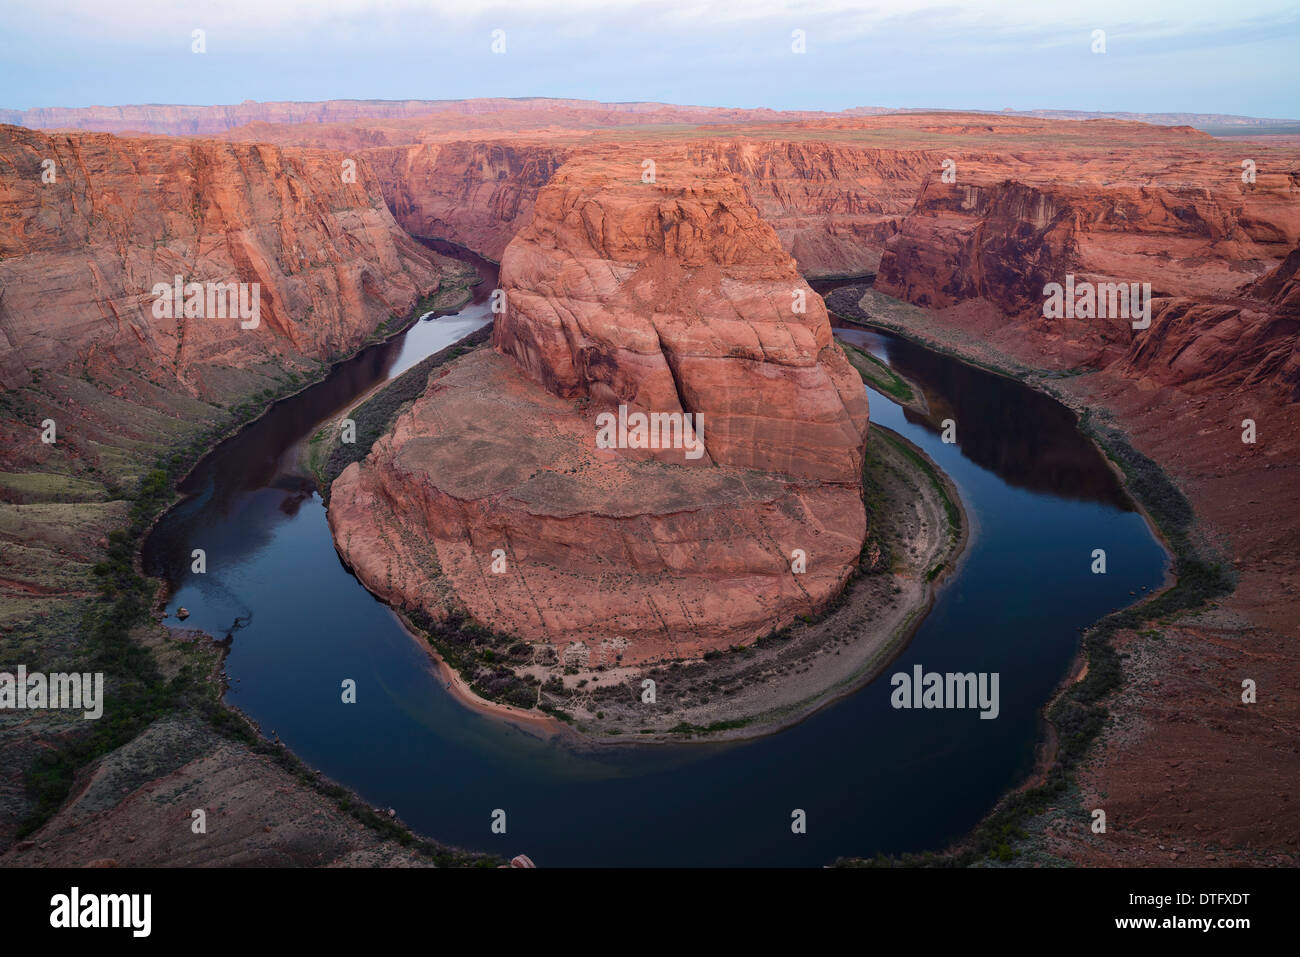 Horseshoe Bend, Colorado River, près de Page, Arizona, USA Photo Stock